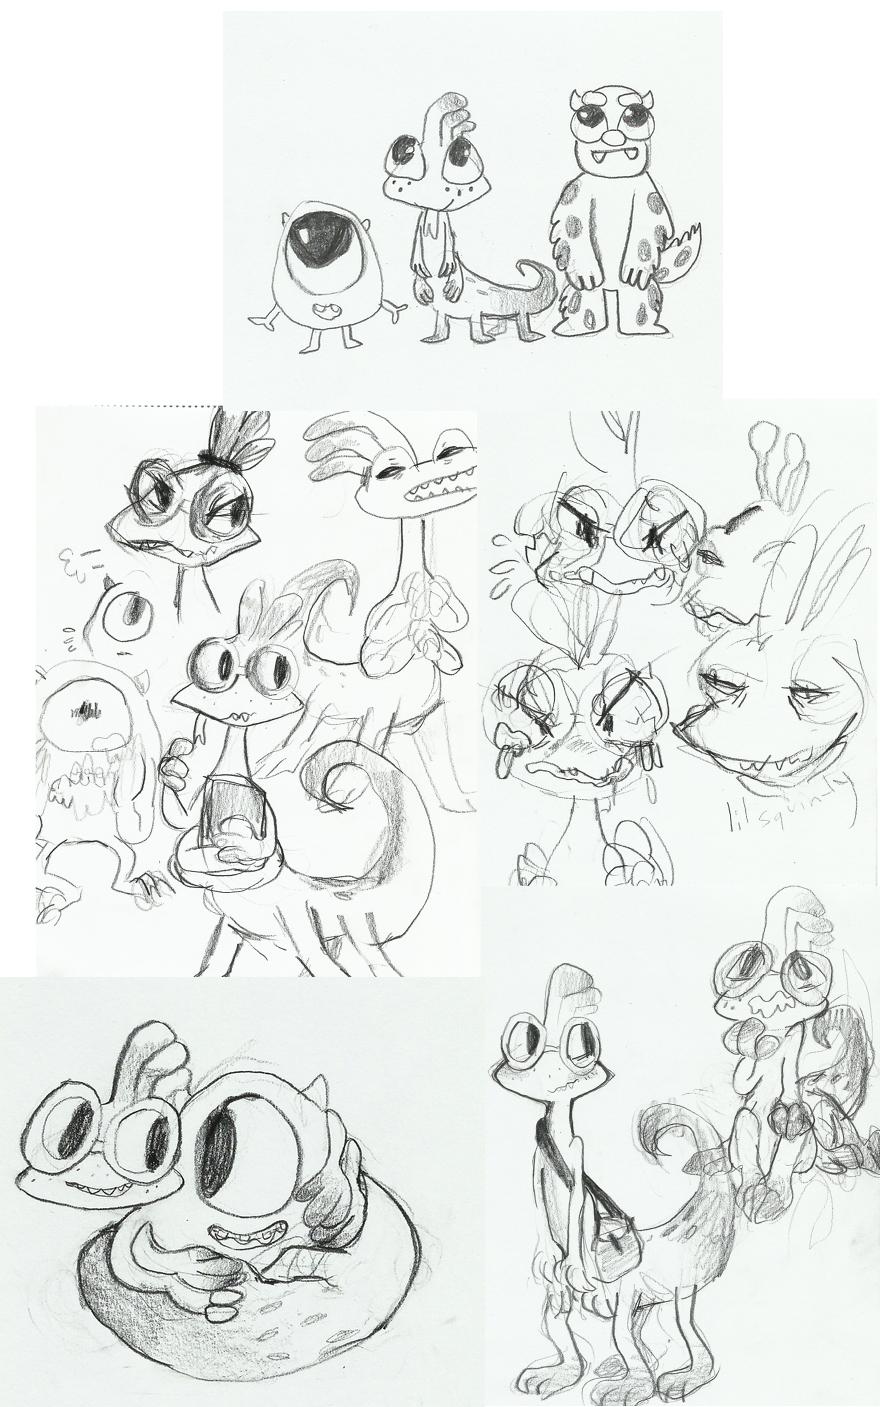 Easy Monster Drawings In Pencil   www.pixshark.com ... Easy Monster Drawings In Pencil